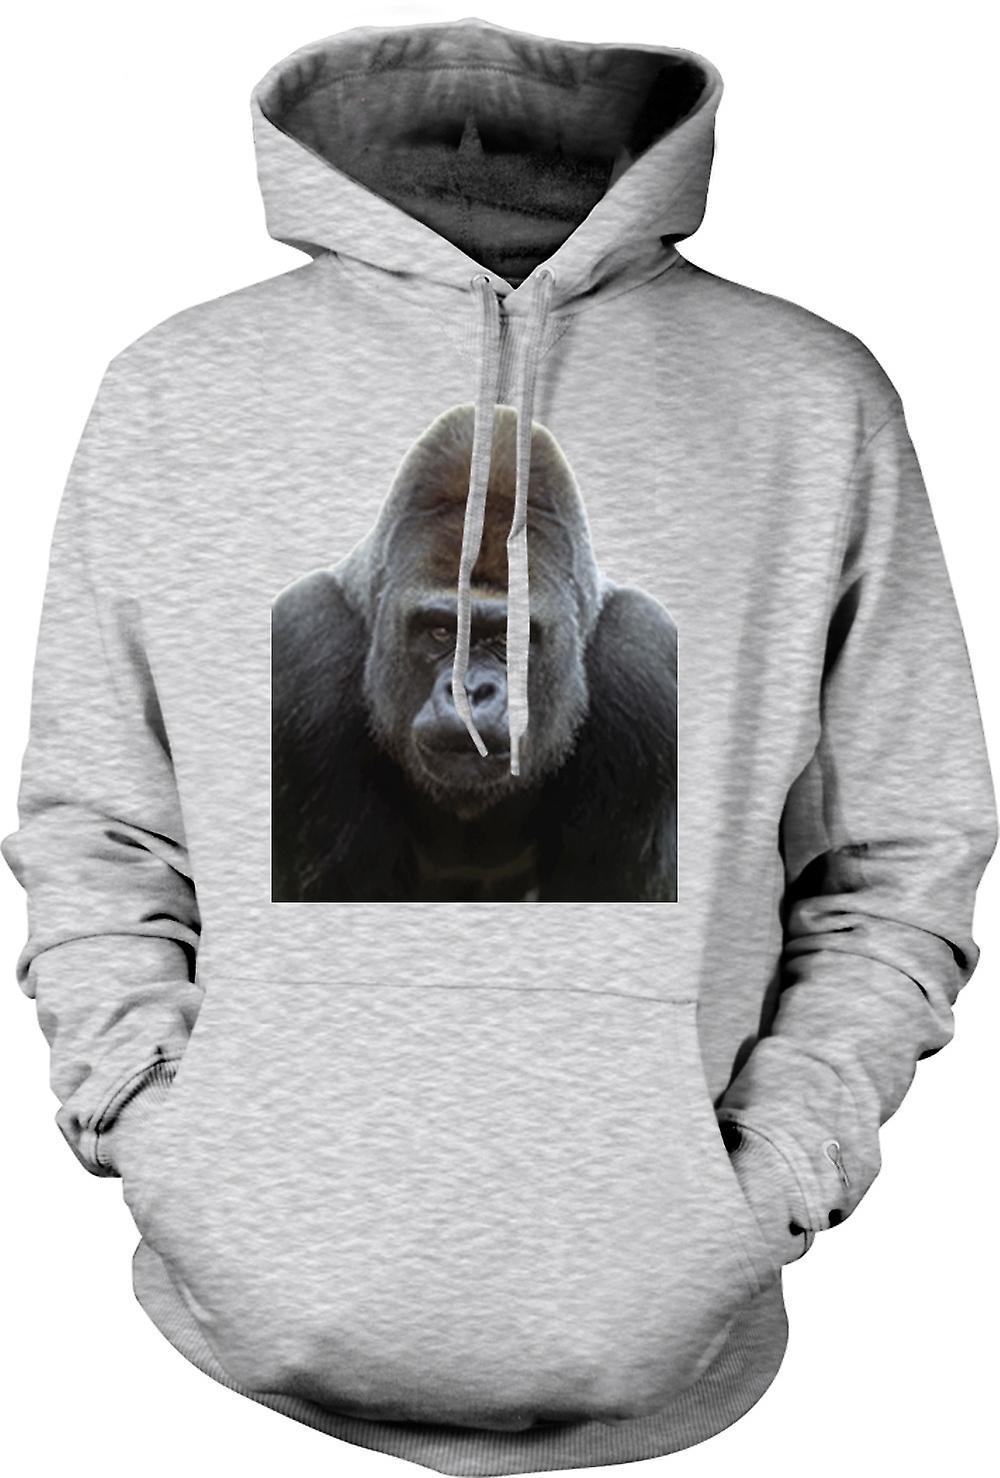 Mens Hoodie - Gorilla Silverback Portrait